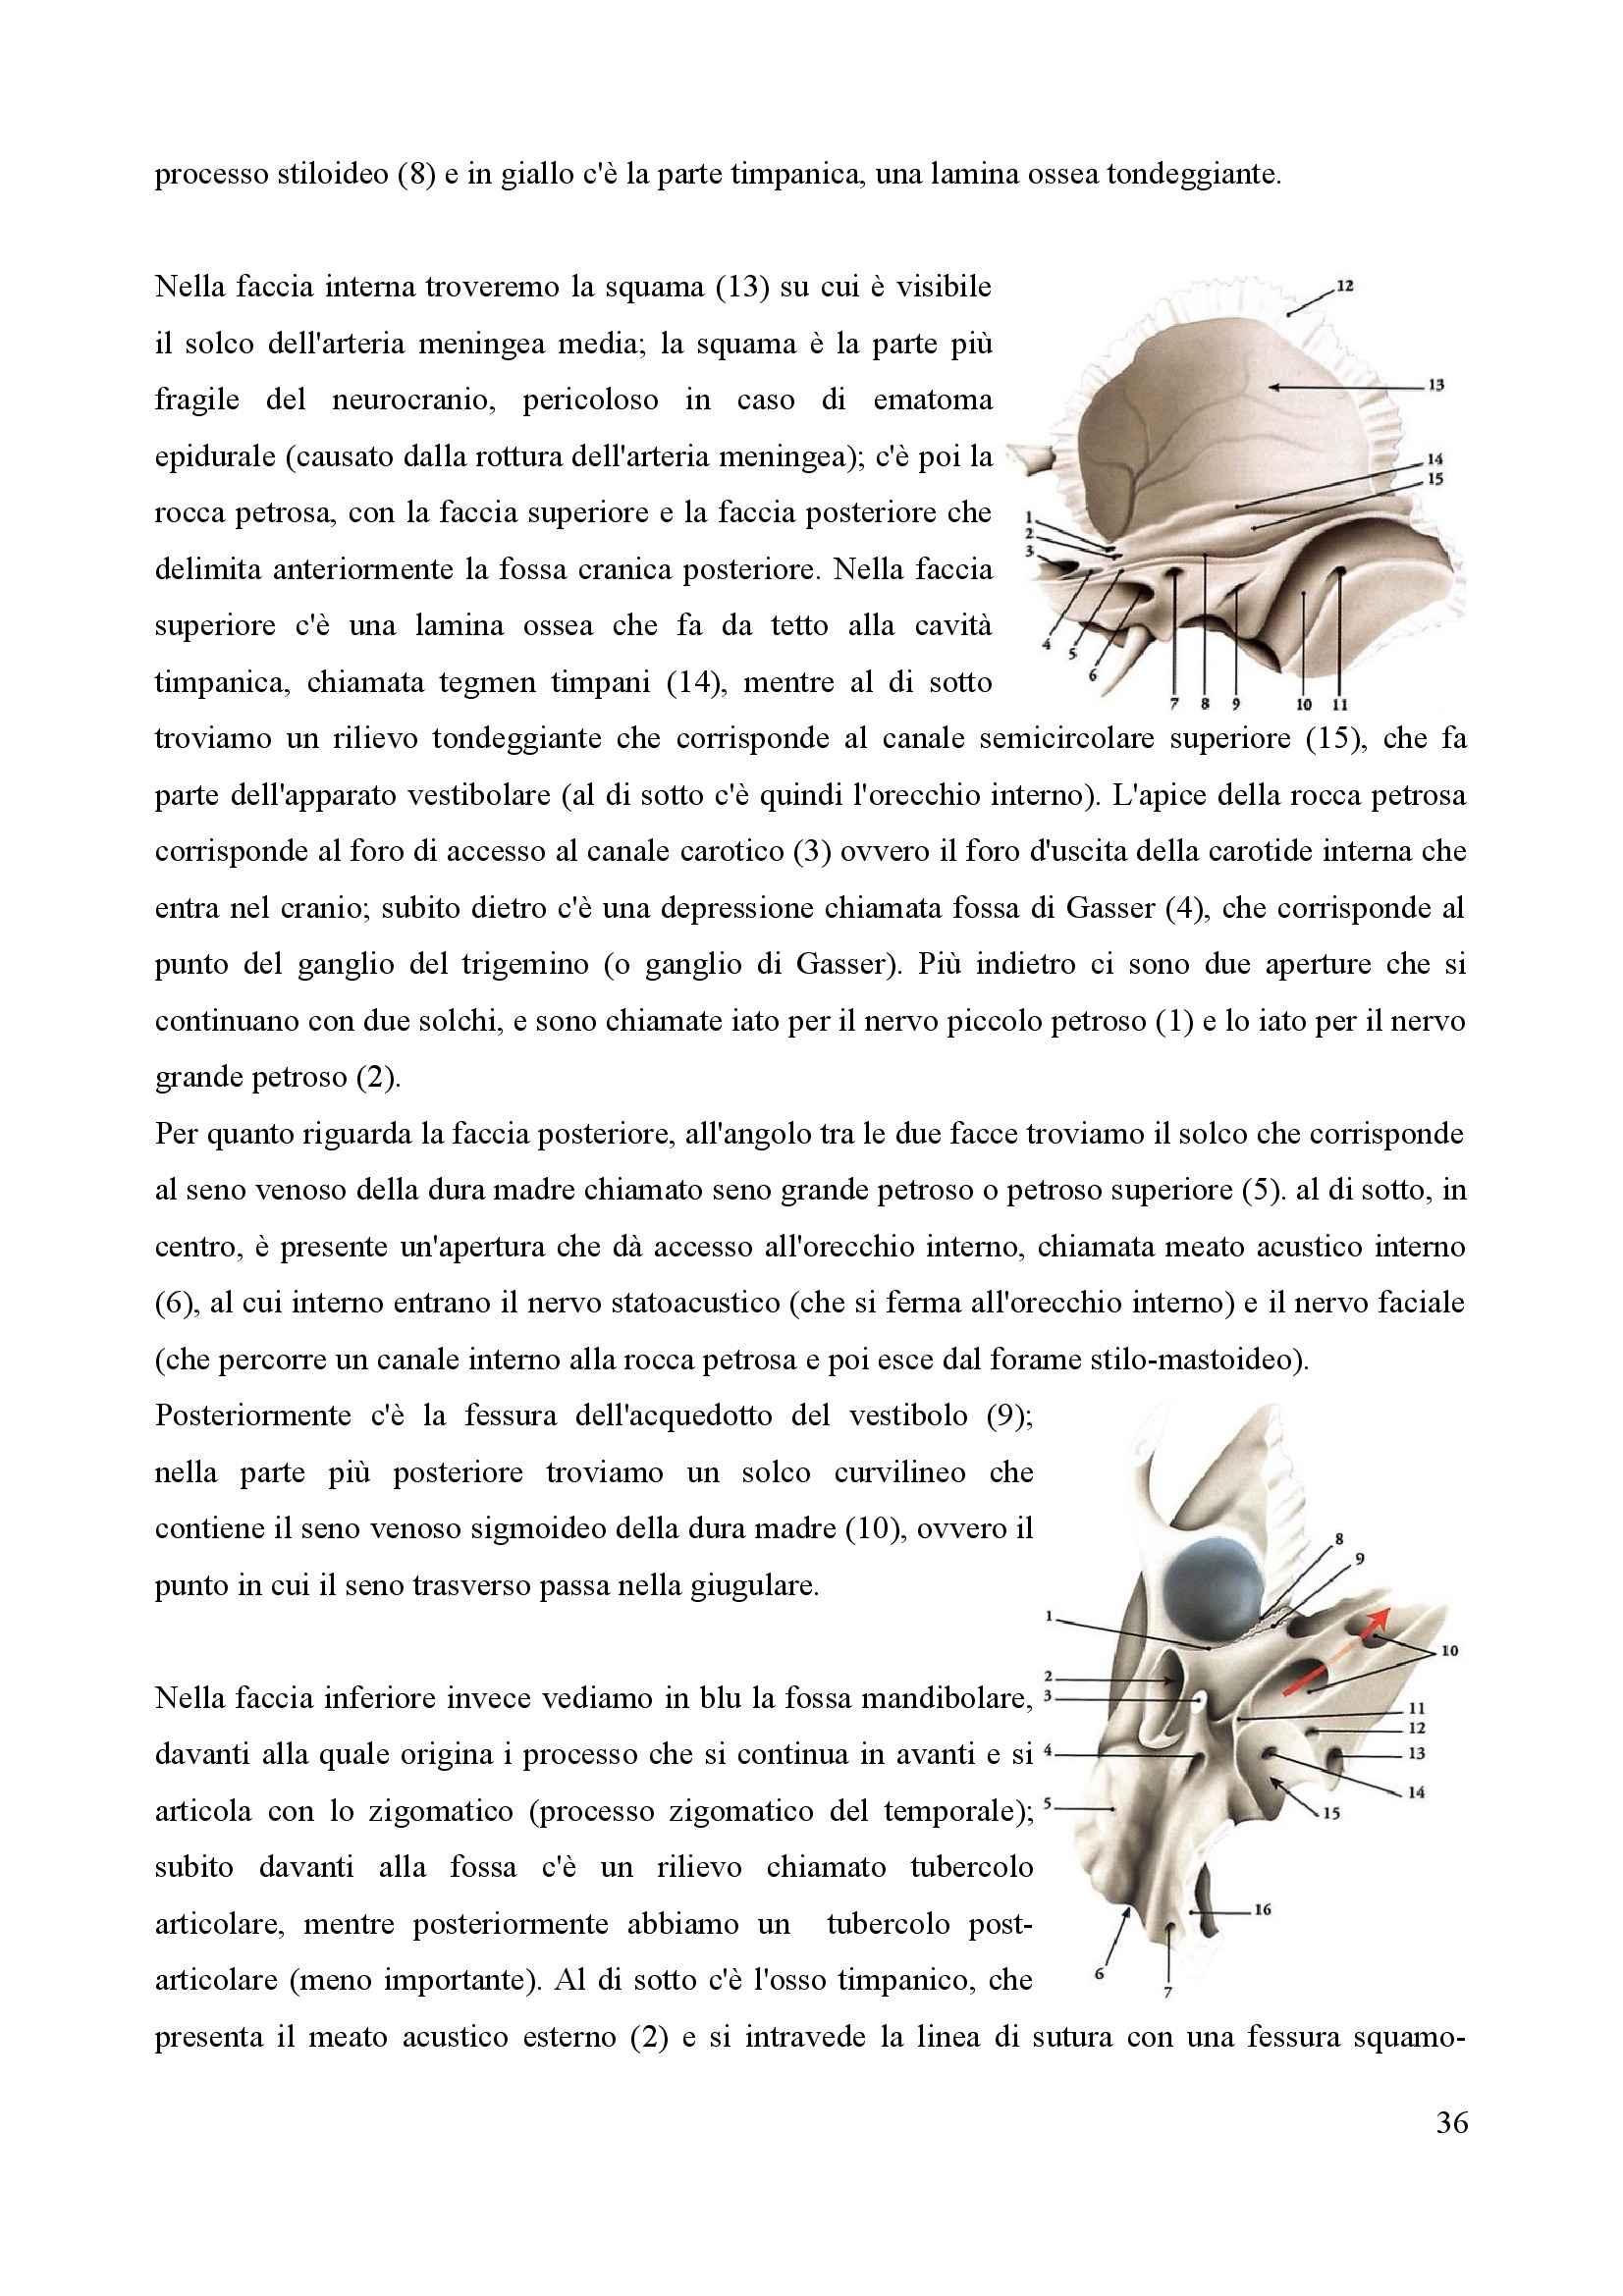 Anatomia I - Apparato locomotore, sistema cardiaco e circolatorio Pag. 36